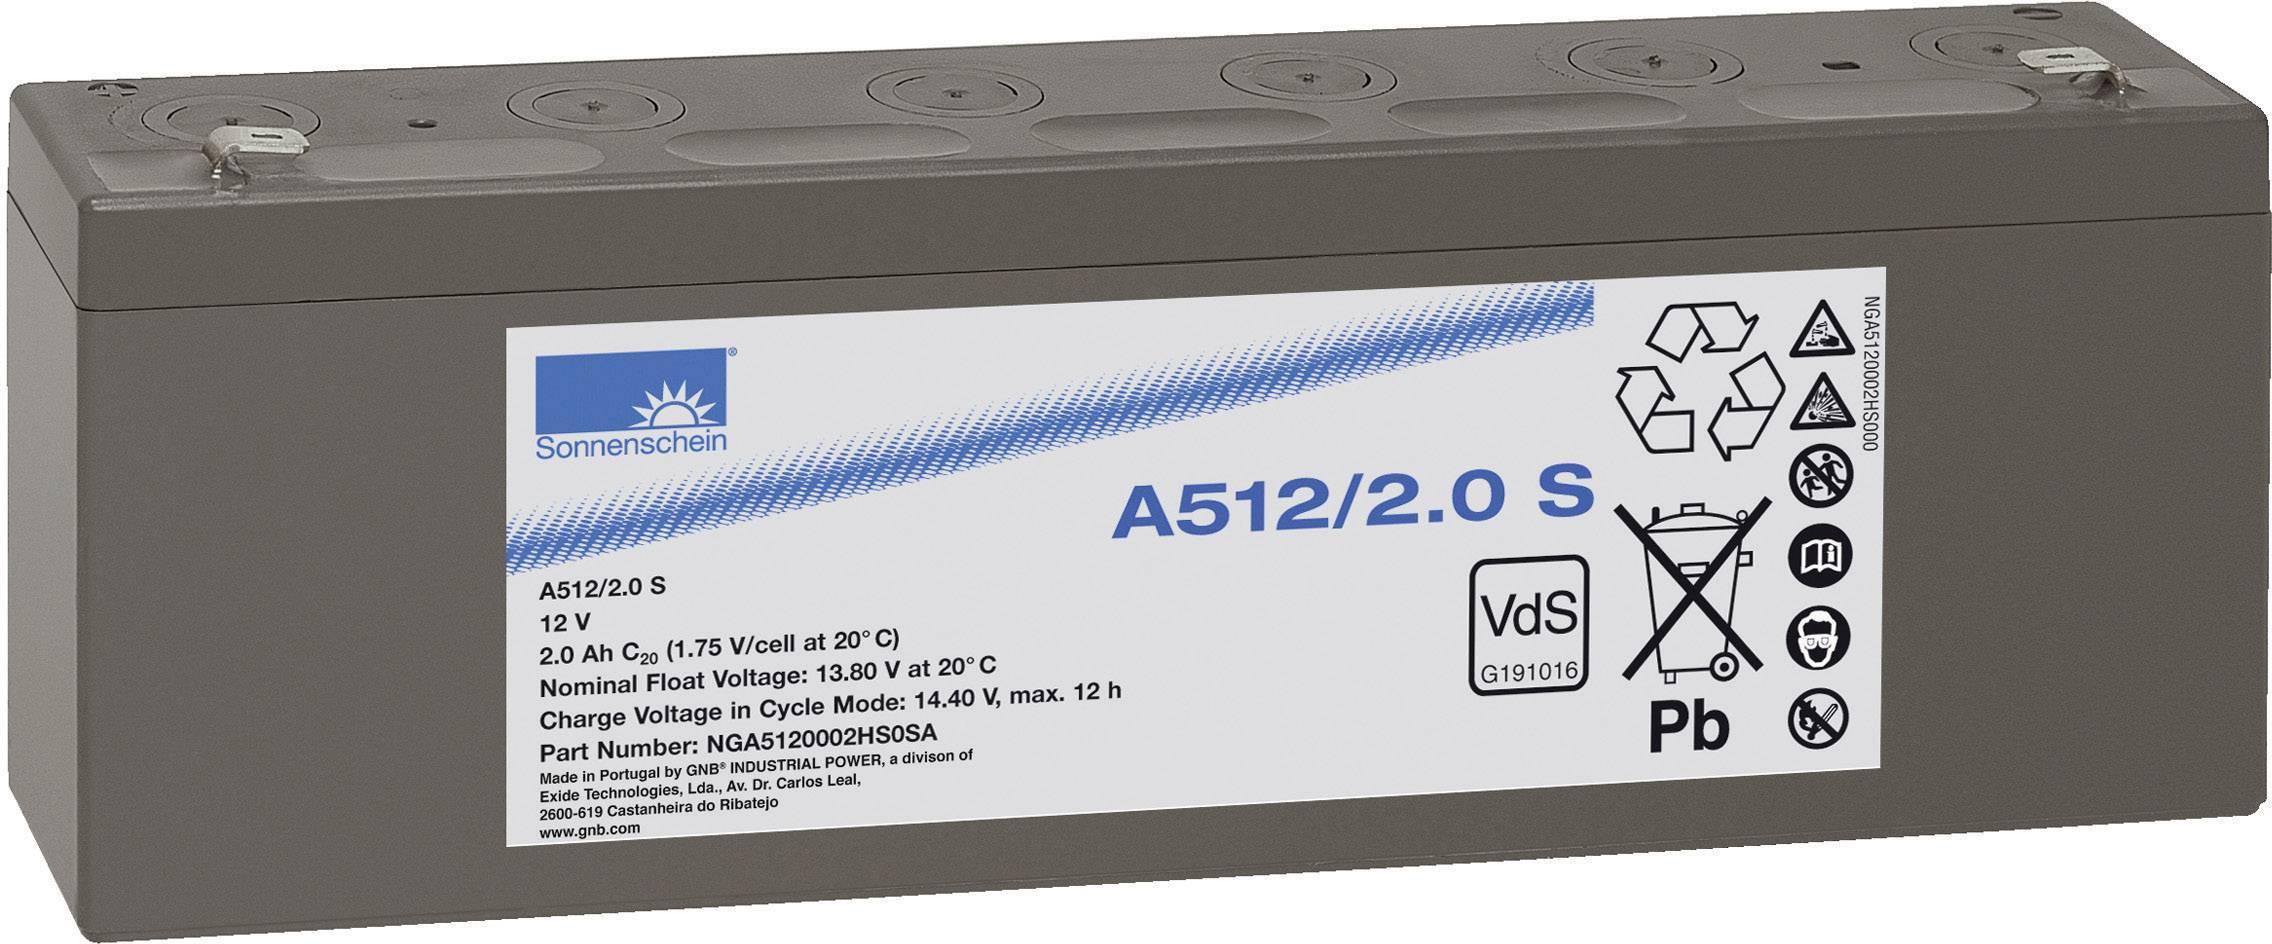 Olovený akumulátor GNB Sonnenschein A512/2 S NGA5120002HS0SA, 2 Ah, 12 V